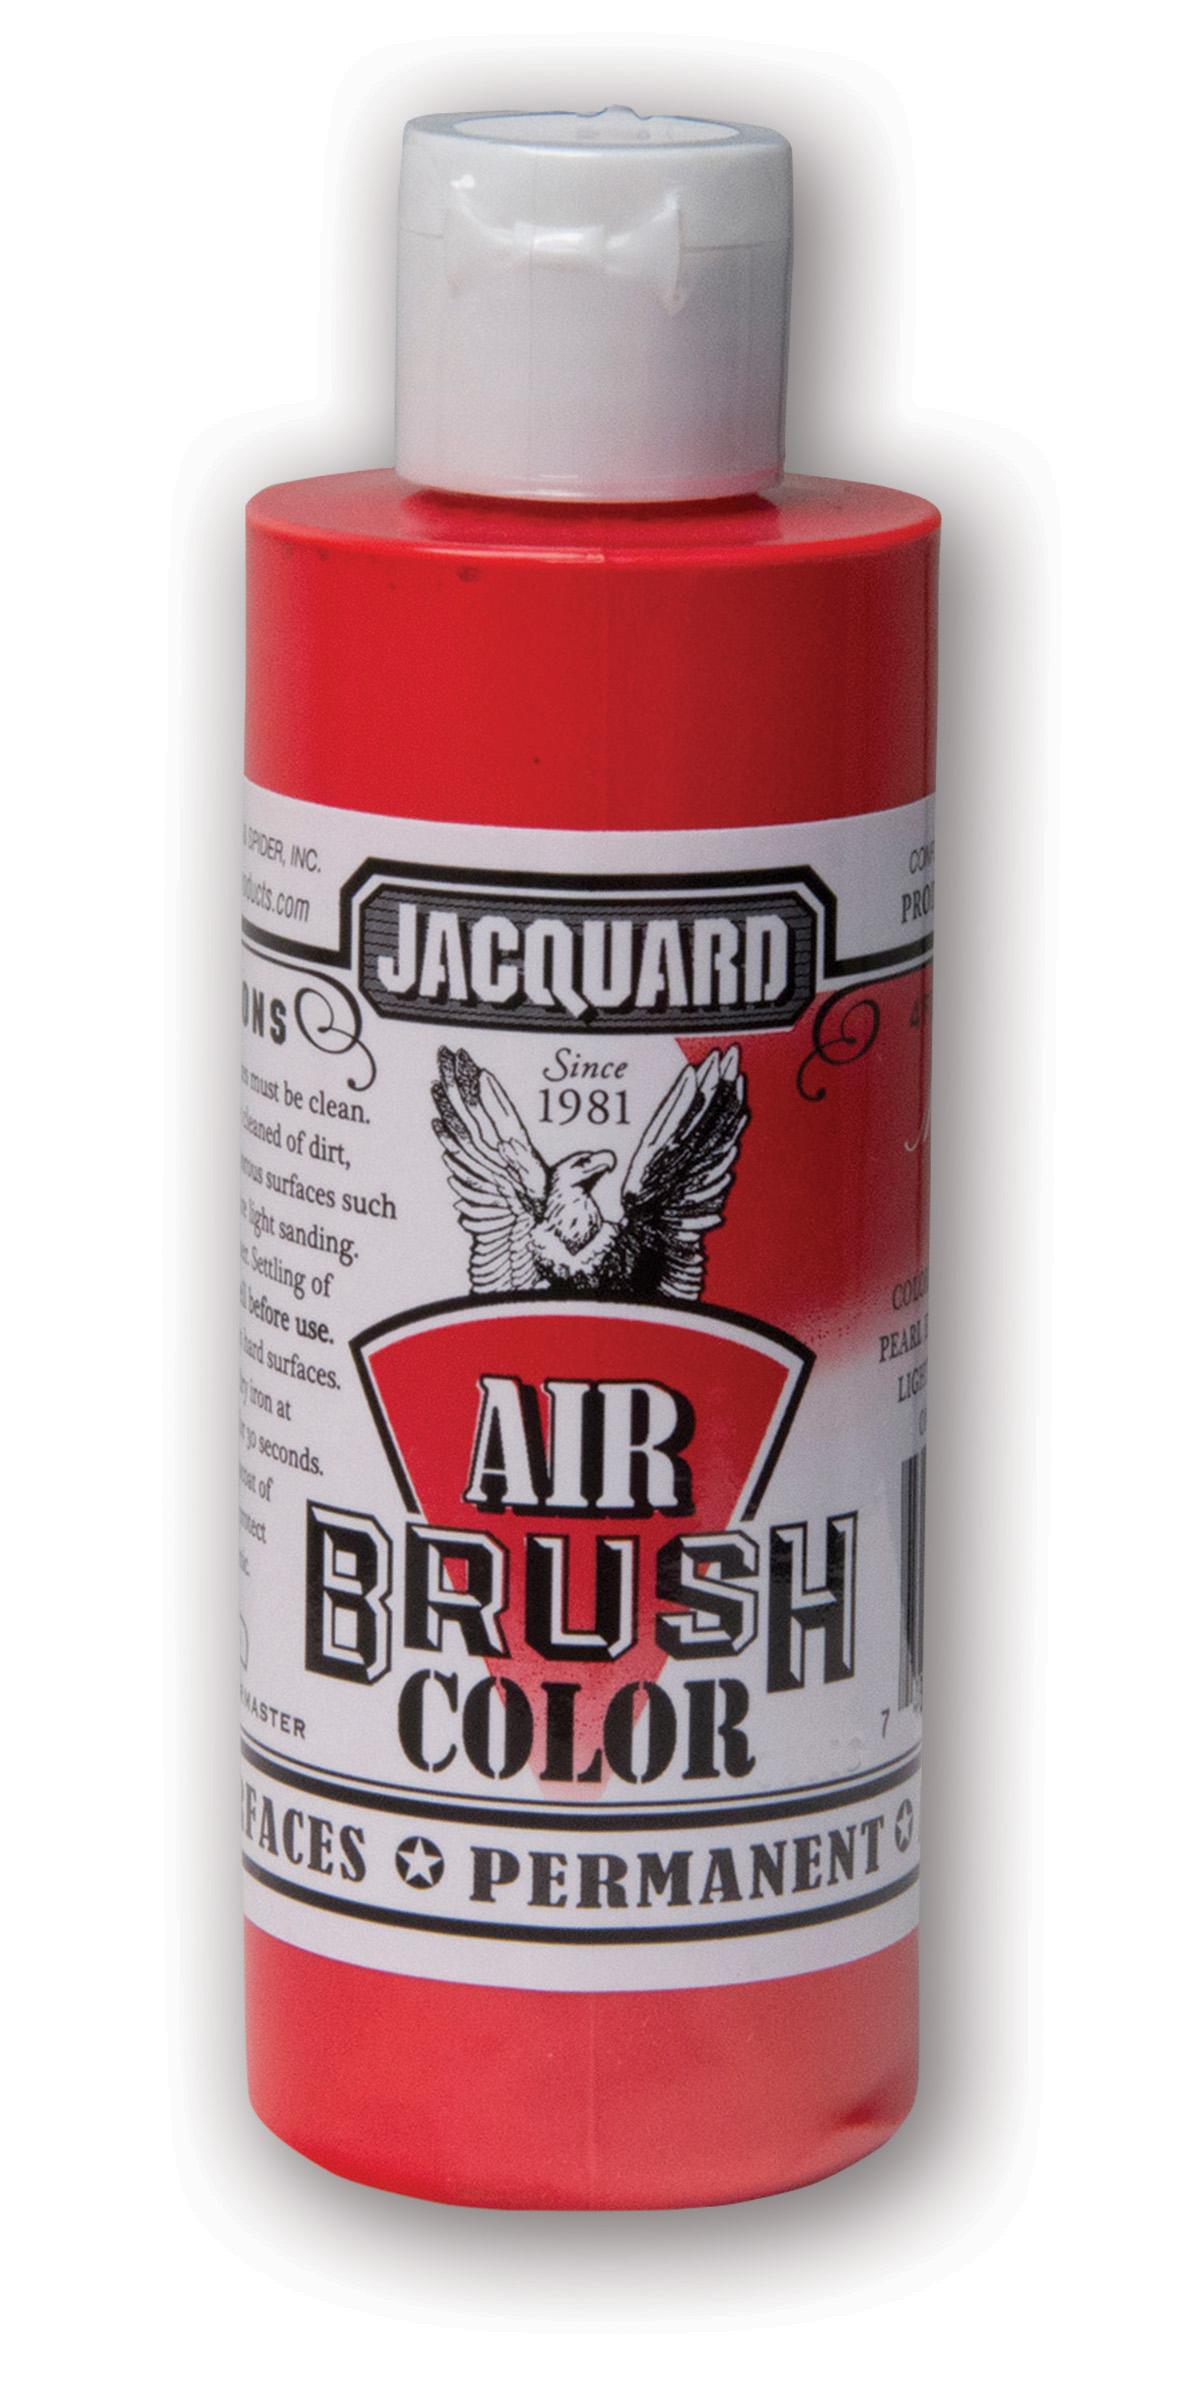 PapierSchereStoff - Jacquard Products Airbrush Color ...